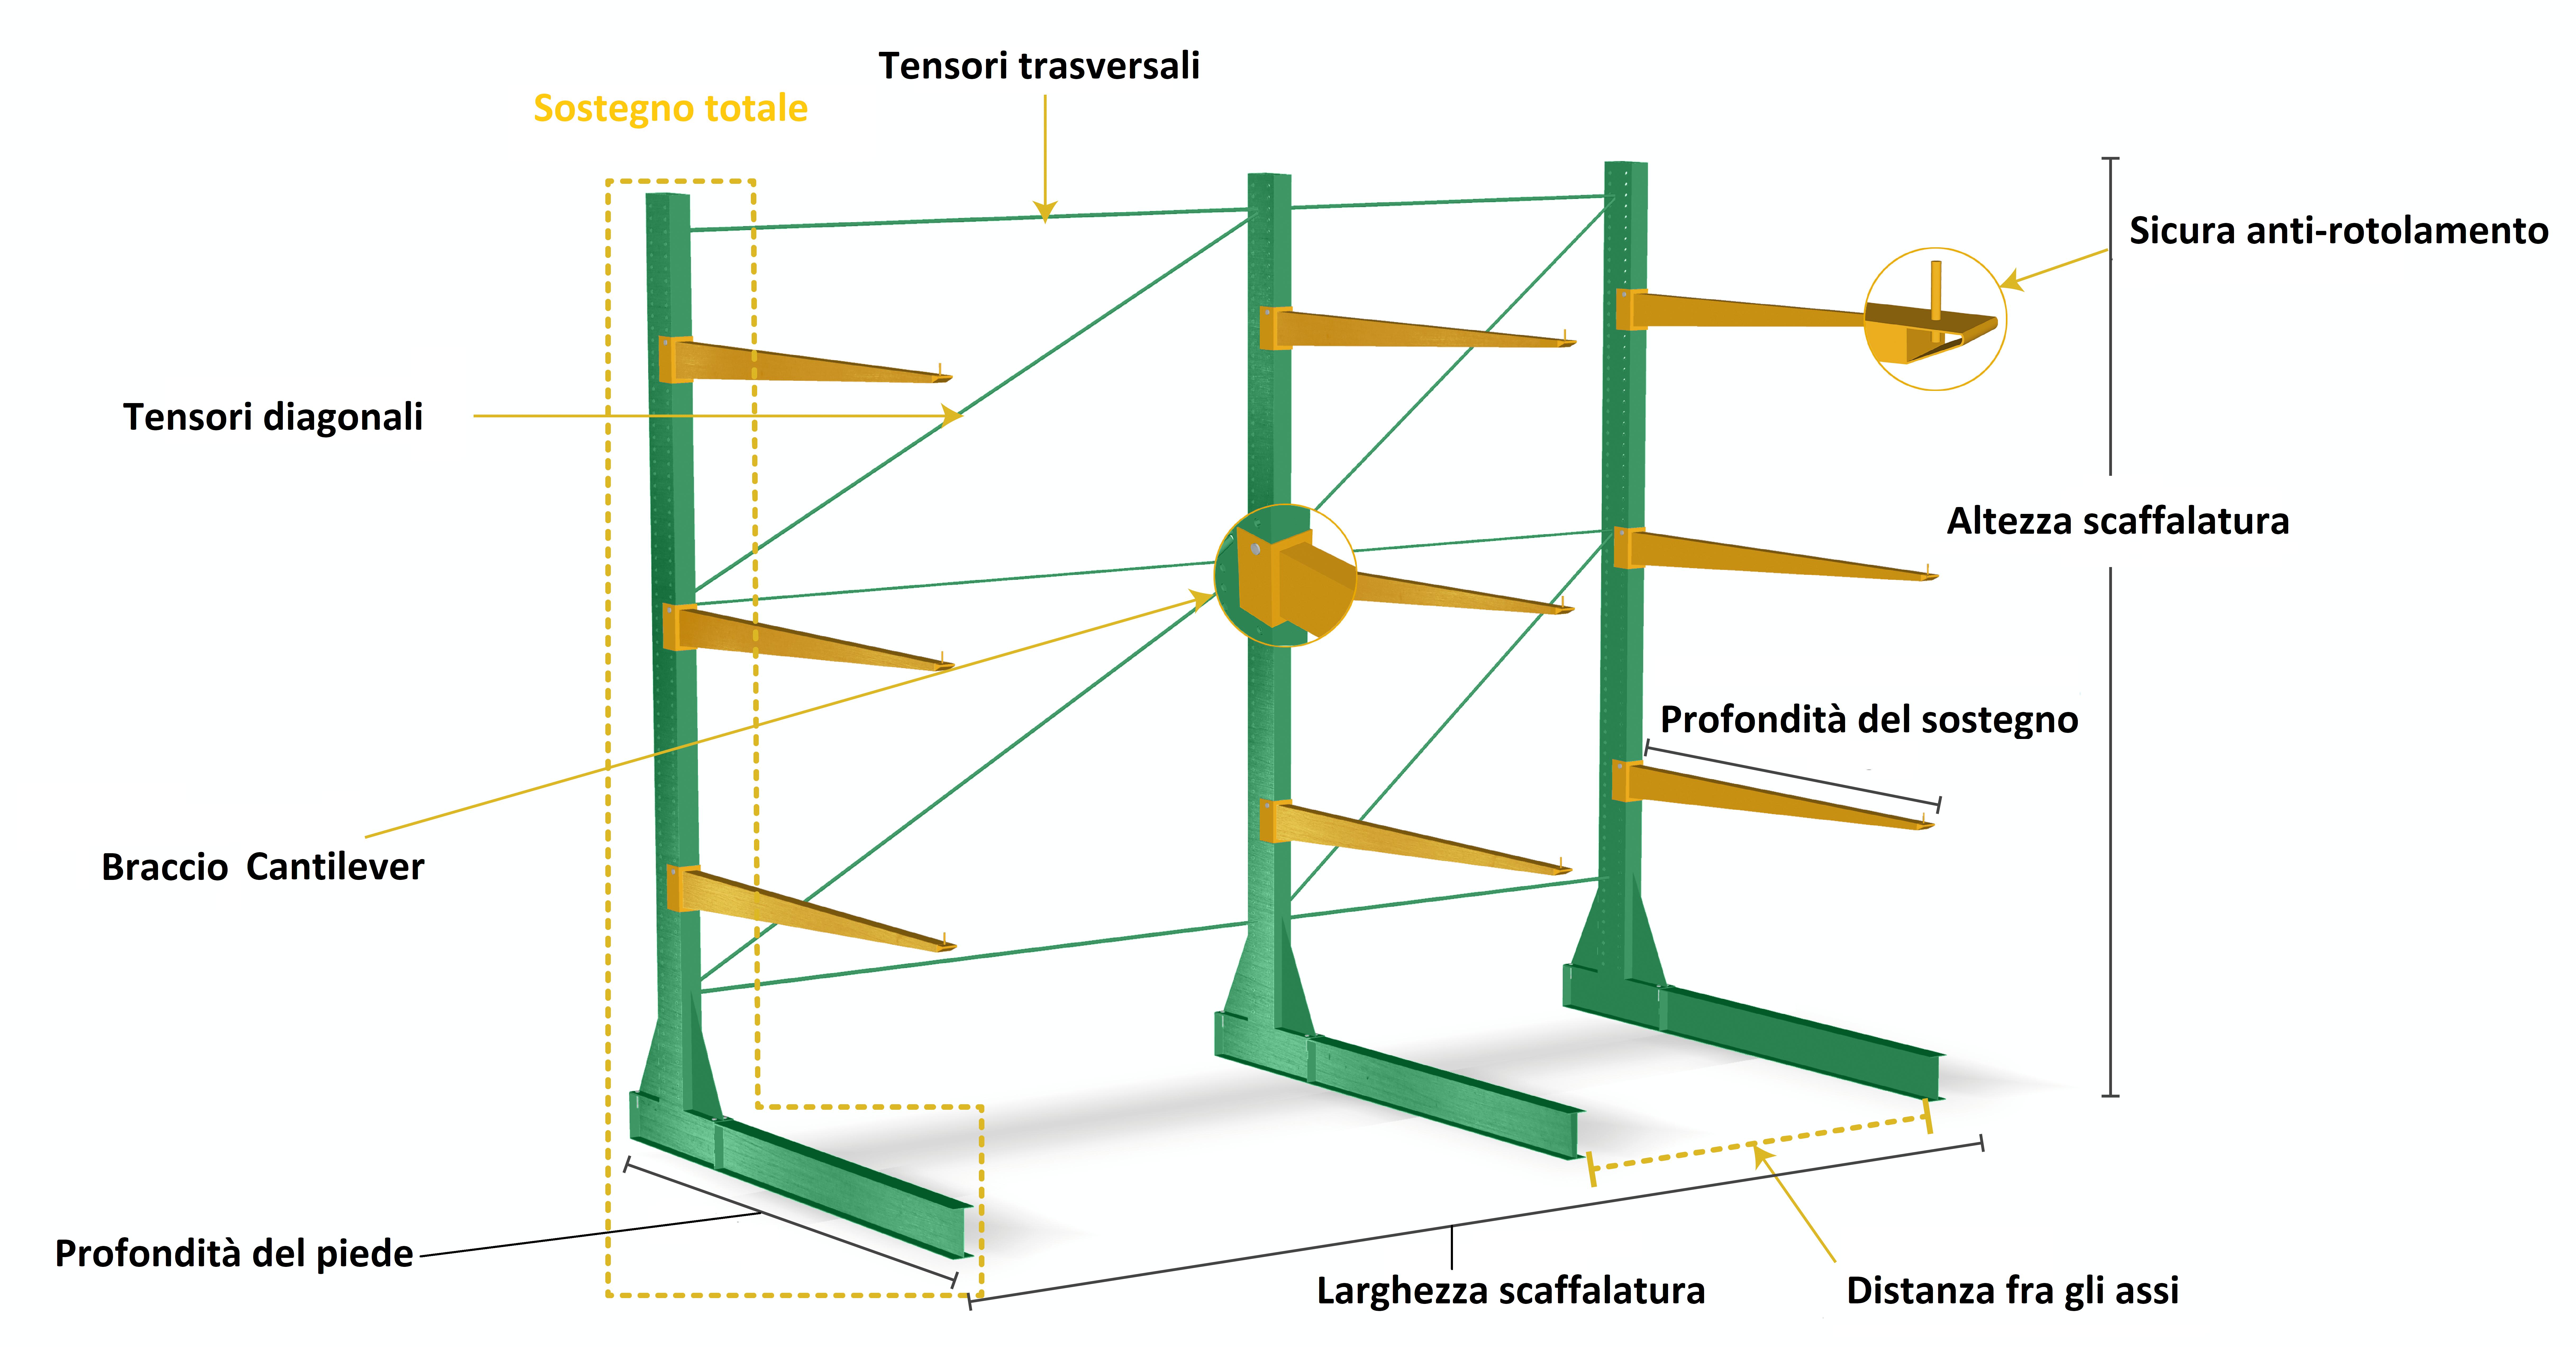 Scaffalature Cantilever Prezzi.Scaffalature Cantilever Usate In Vendita Online